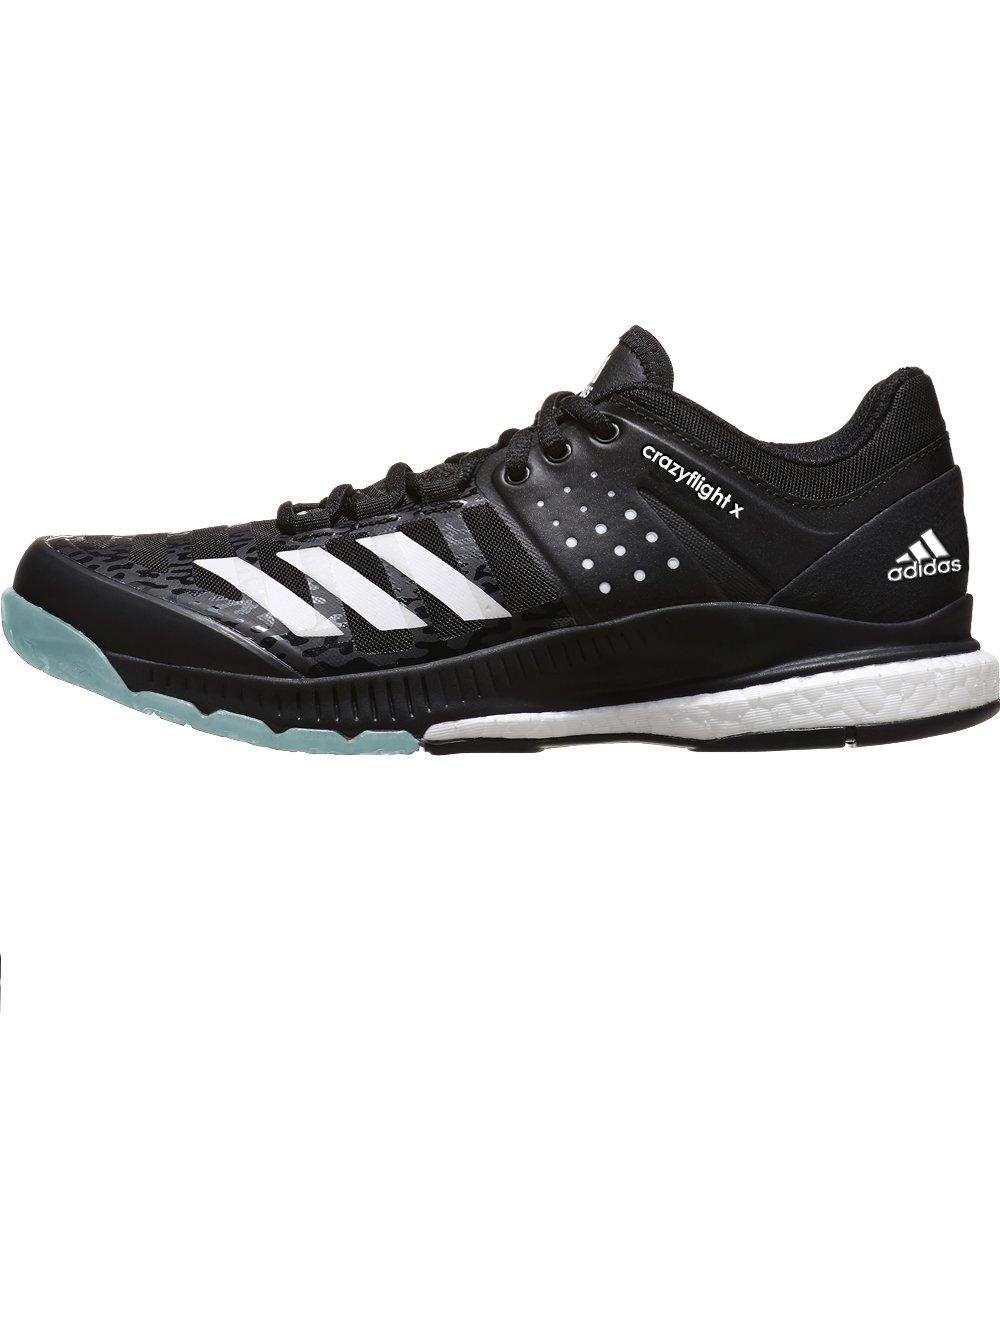 adidas Women's Crazyflight X Volleyball Shoe Black/White/Light Solid Grey,11 M US